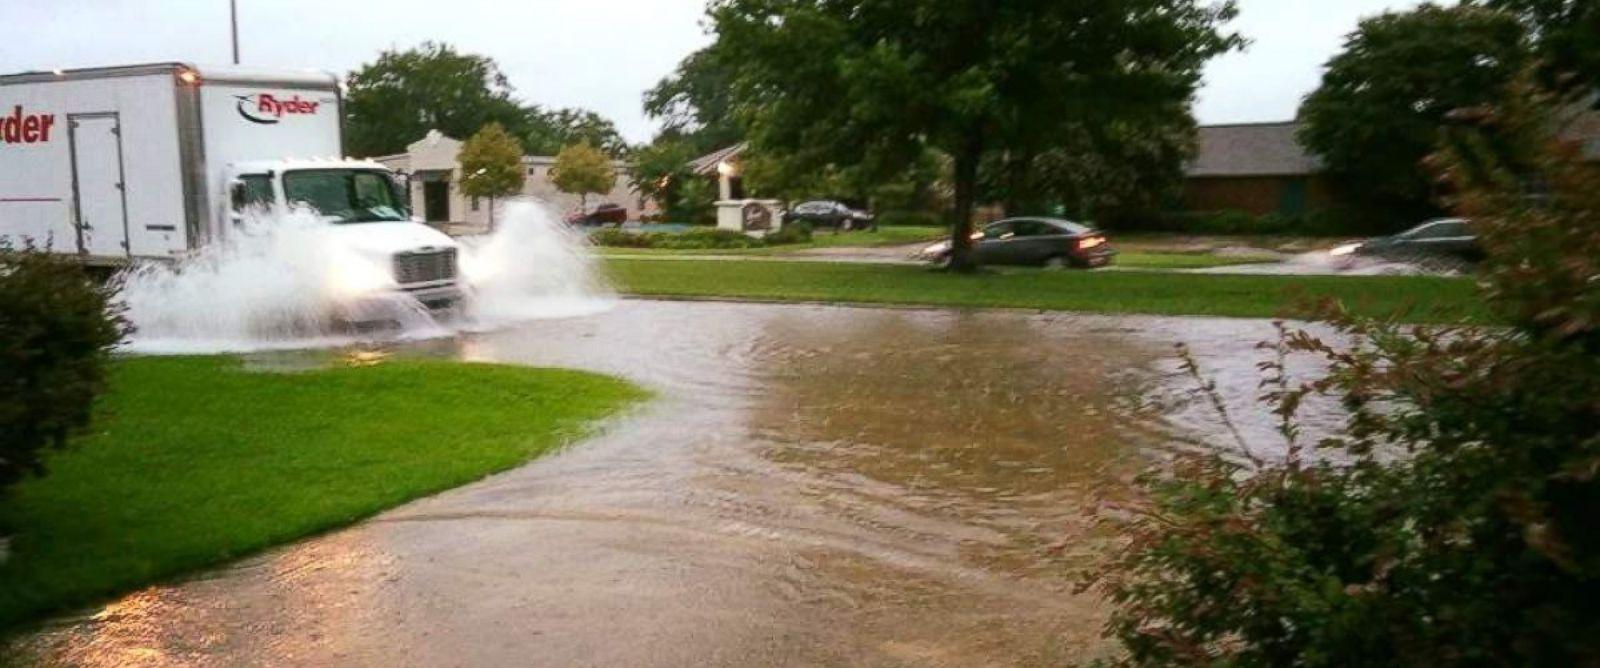 Louisiana Flooding: Elderly Man Dies in High Waters, State ...